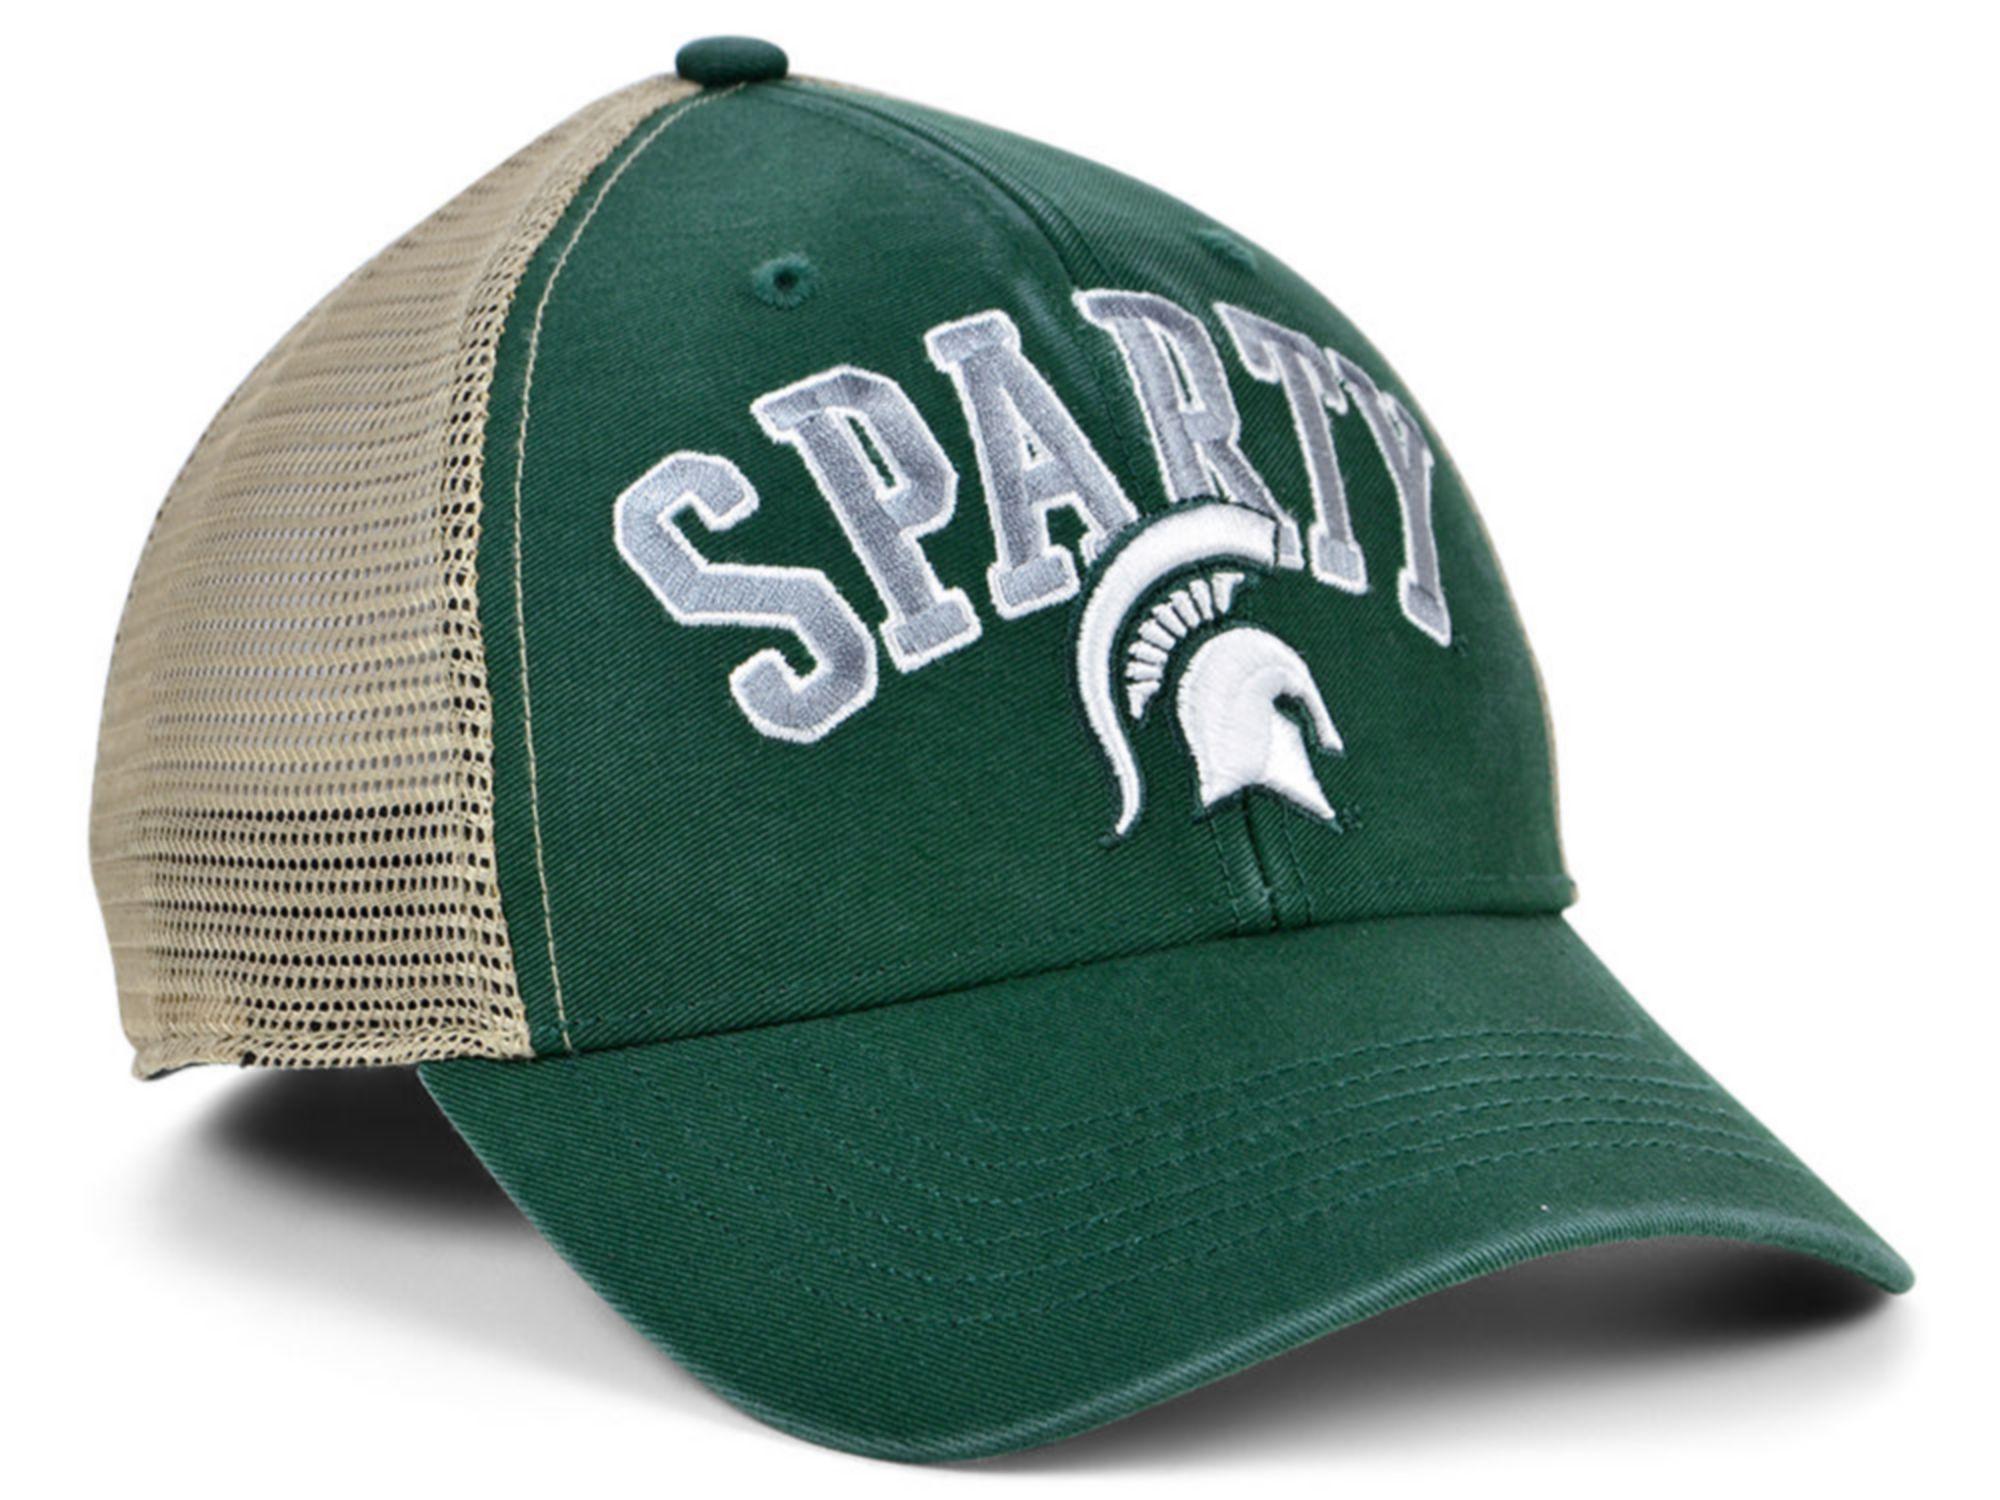 '47 Brand Michigan State Spartans Outland Trucker Cap & Reviews - NCAA - Sports Fan Shop - Macy's